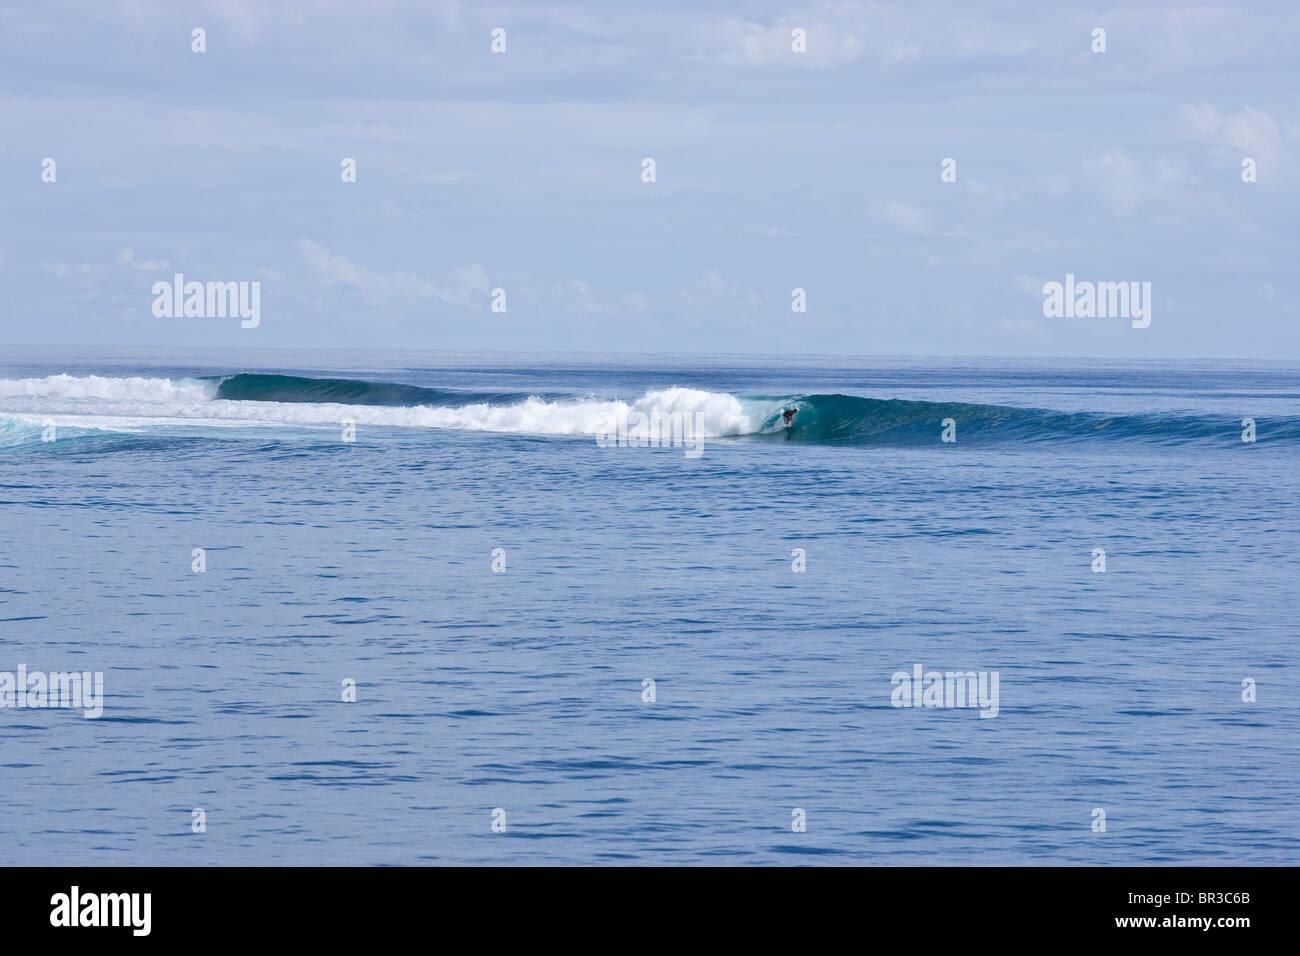 surfingin the Mentawai Islands - Stock Image